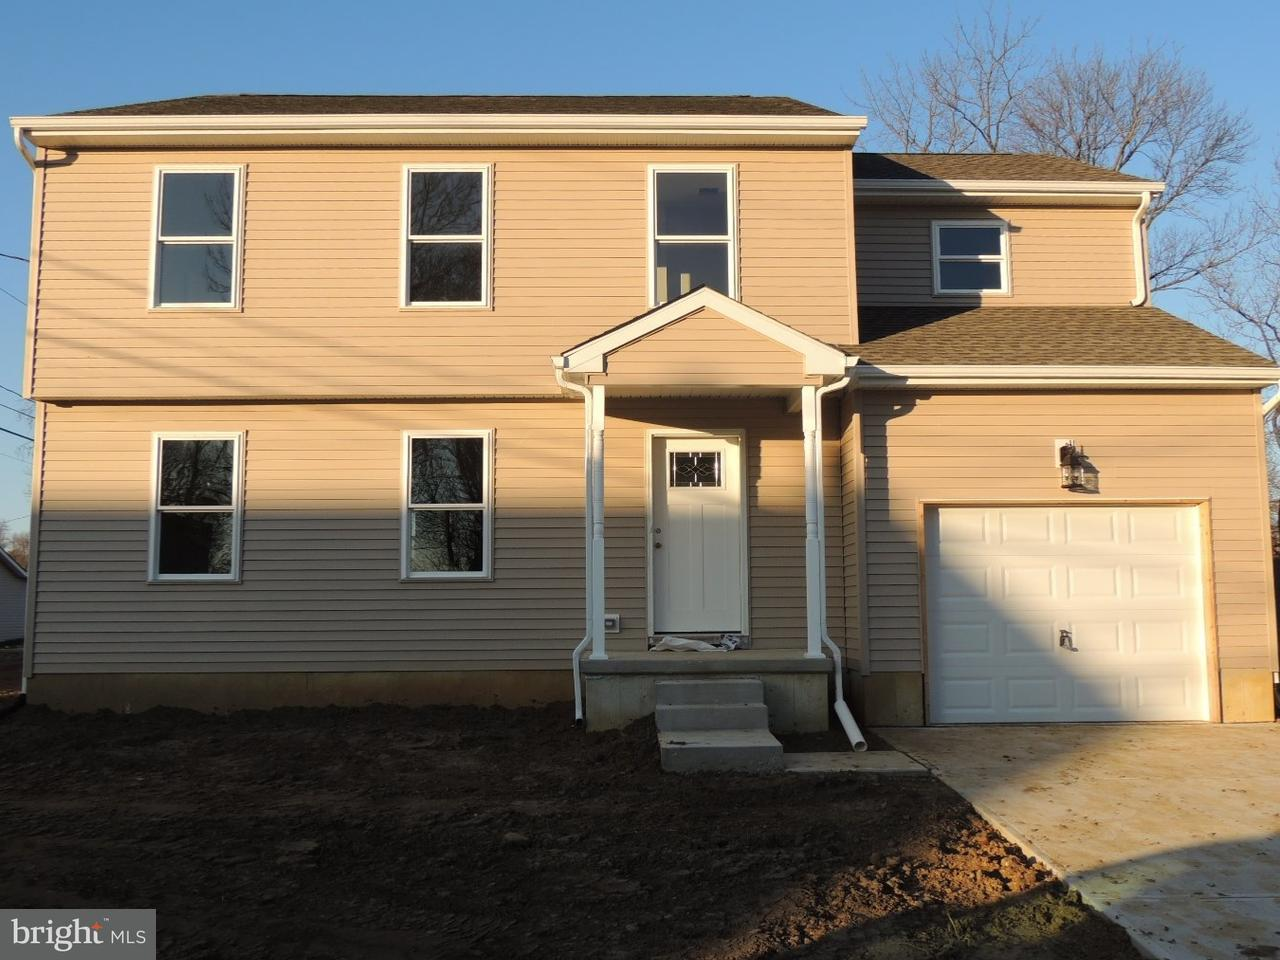 Single Family Home for Sale at 209 WASHINGTON Street Fieldsboro, New Jersey 08505 United States